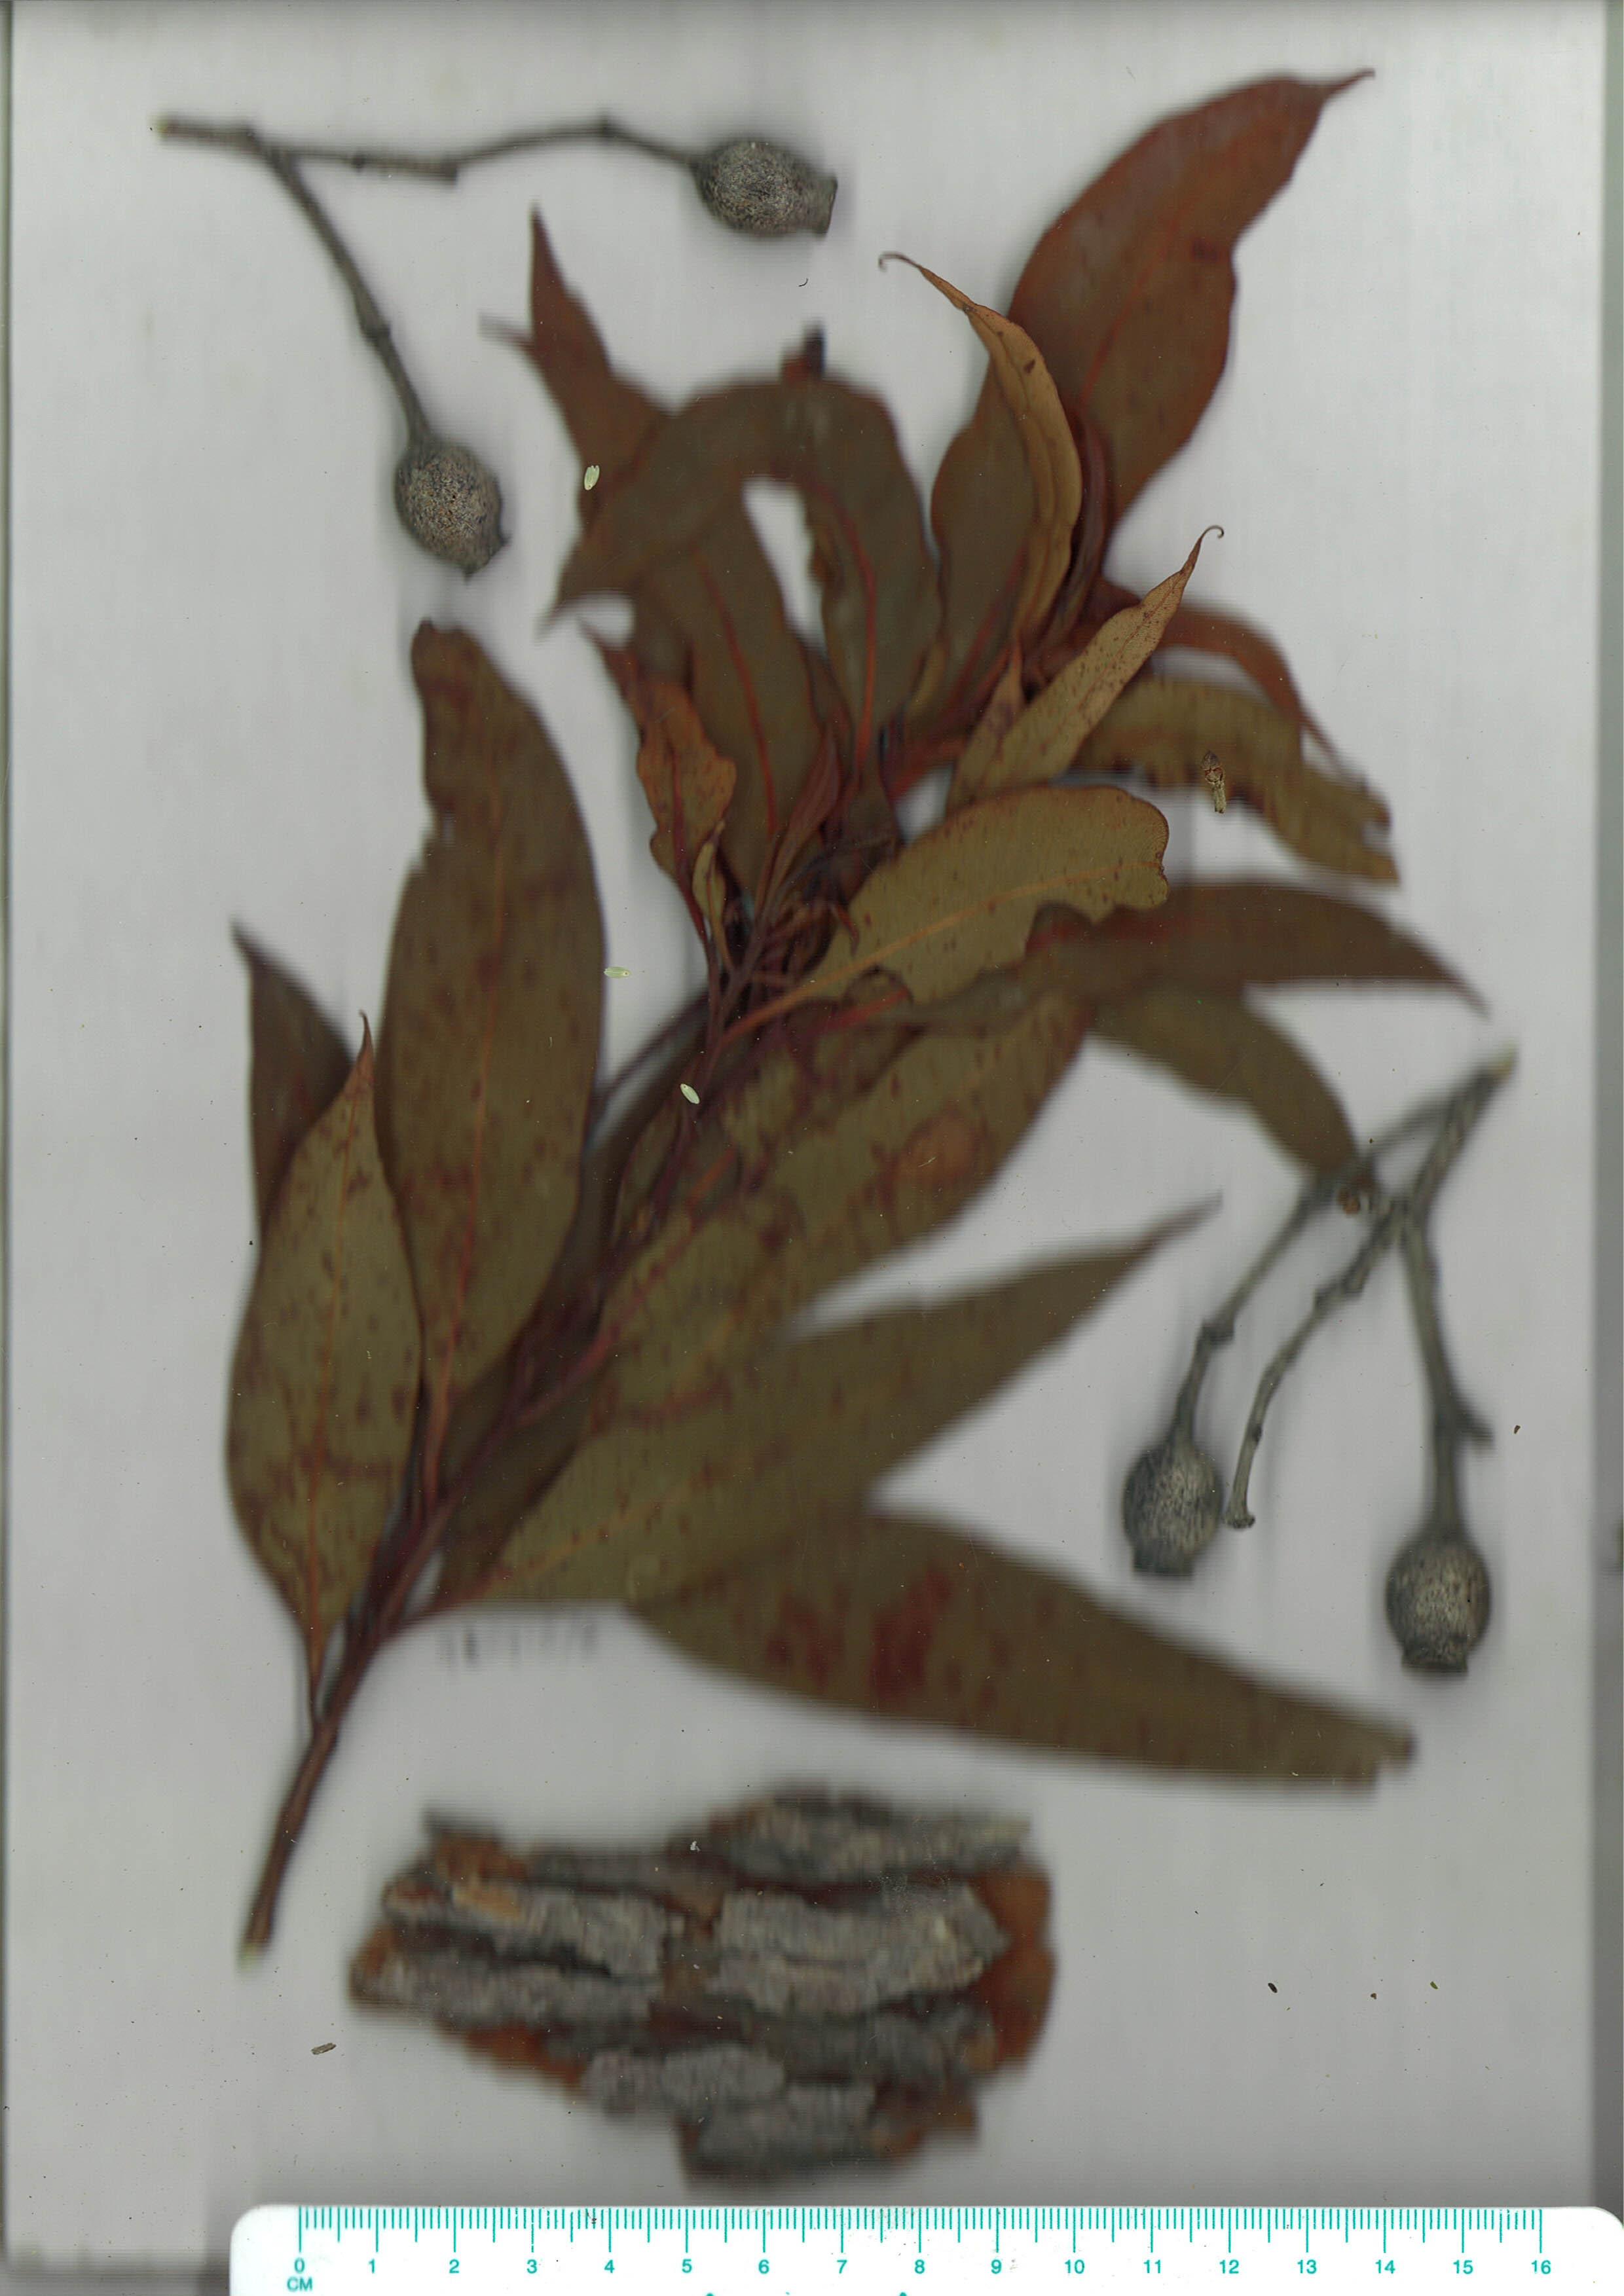 Scanned herbarium image of Corymbia gummifera